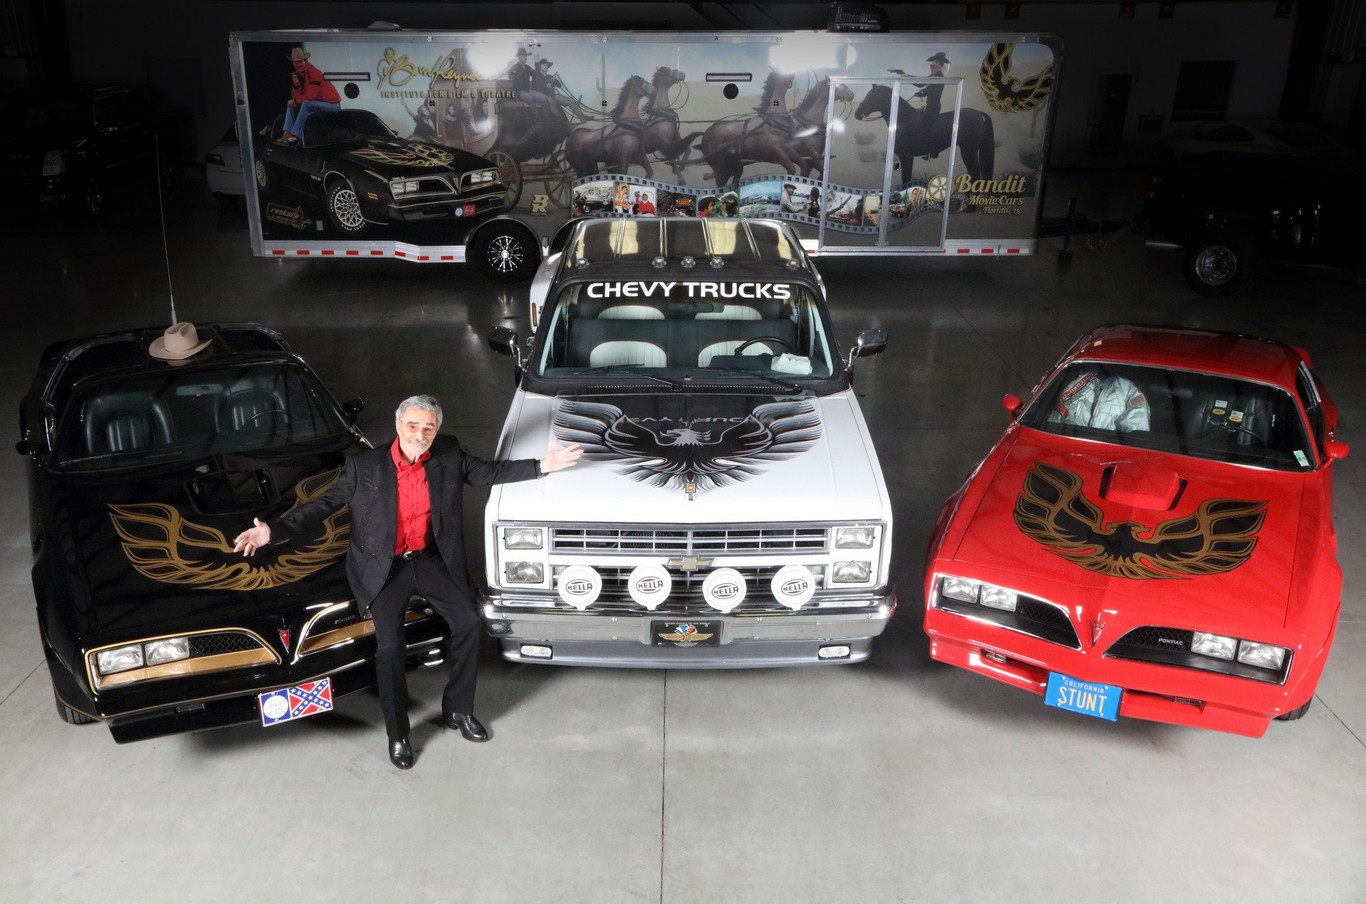 2021 Pontiac Firebird Trans Am Review and Release date